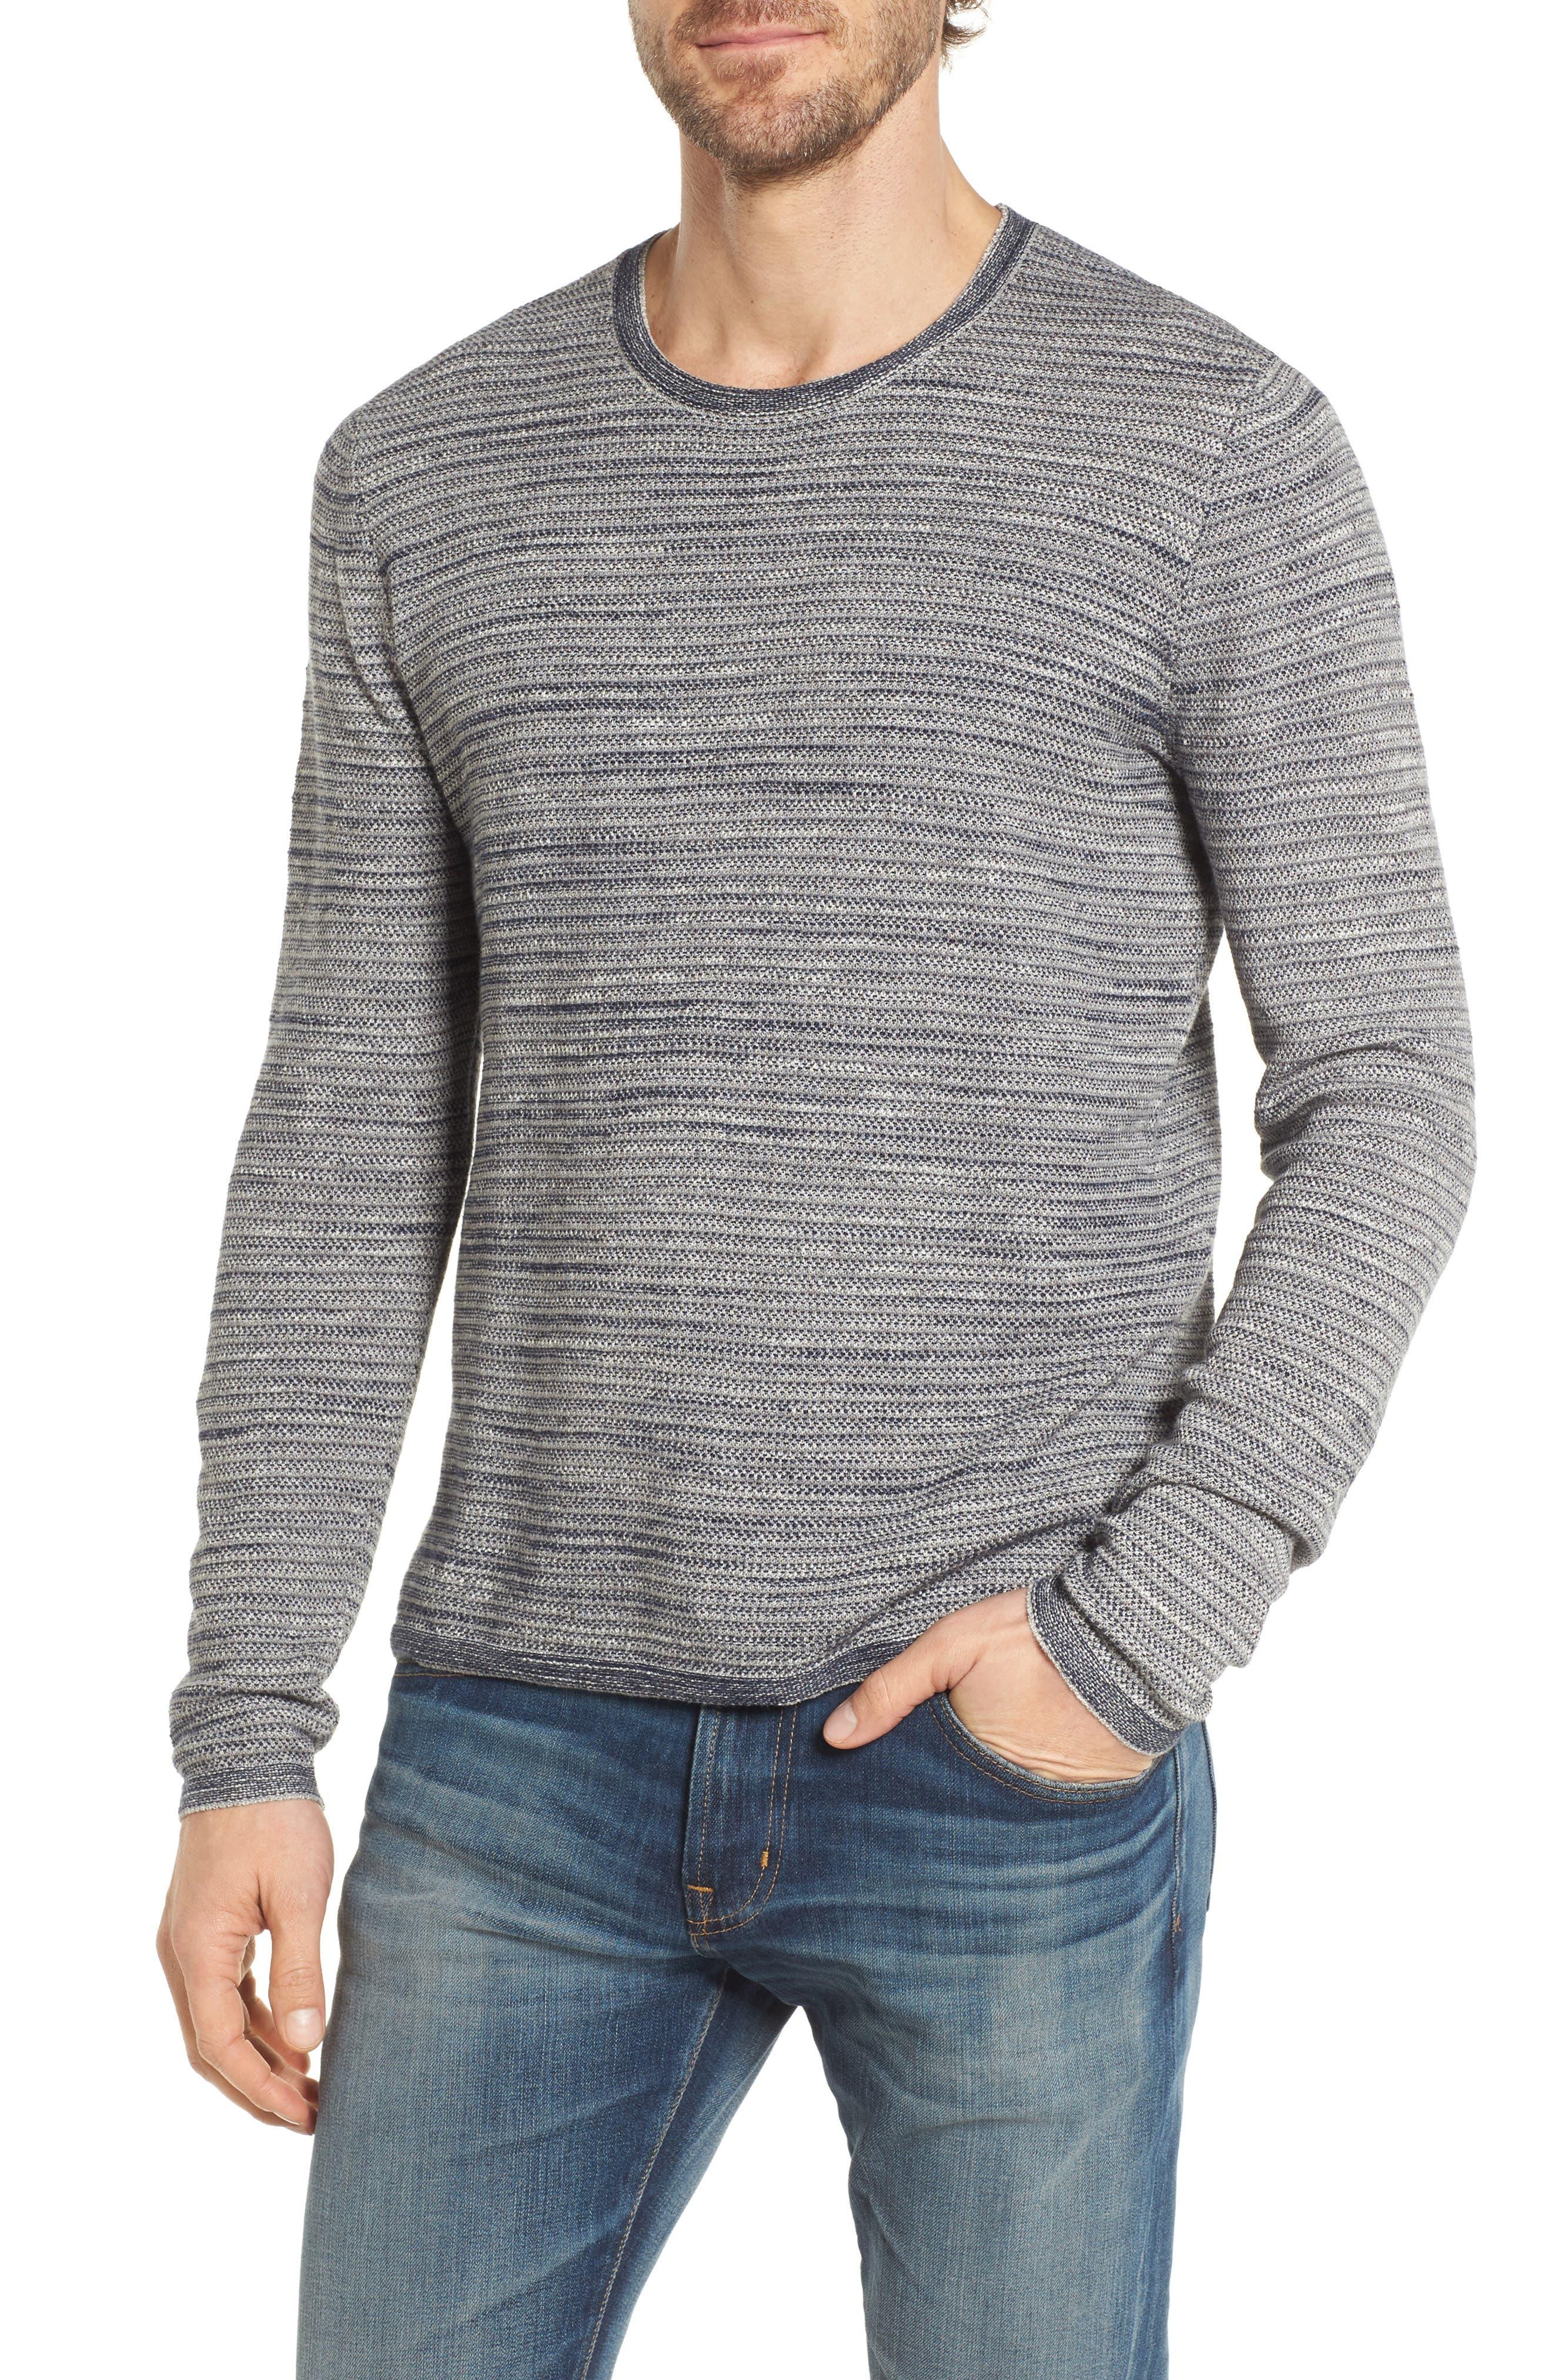 Alternate Image 1 Selected - Grayers Bird's Eye Cotton Jacquard Sweater